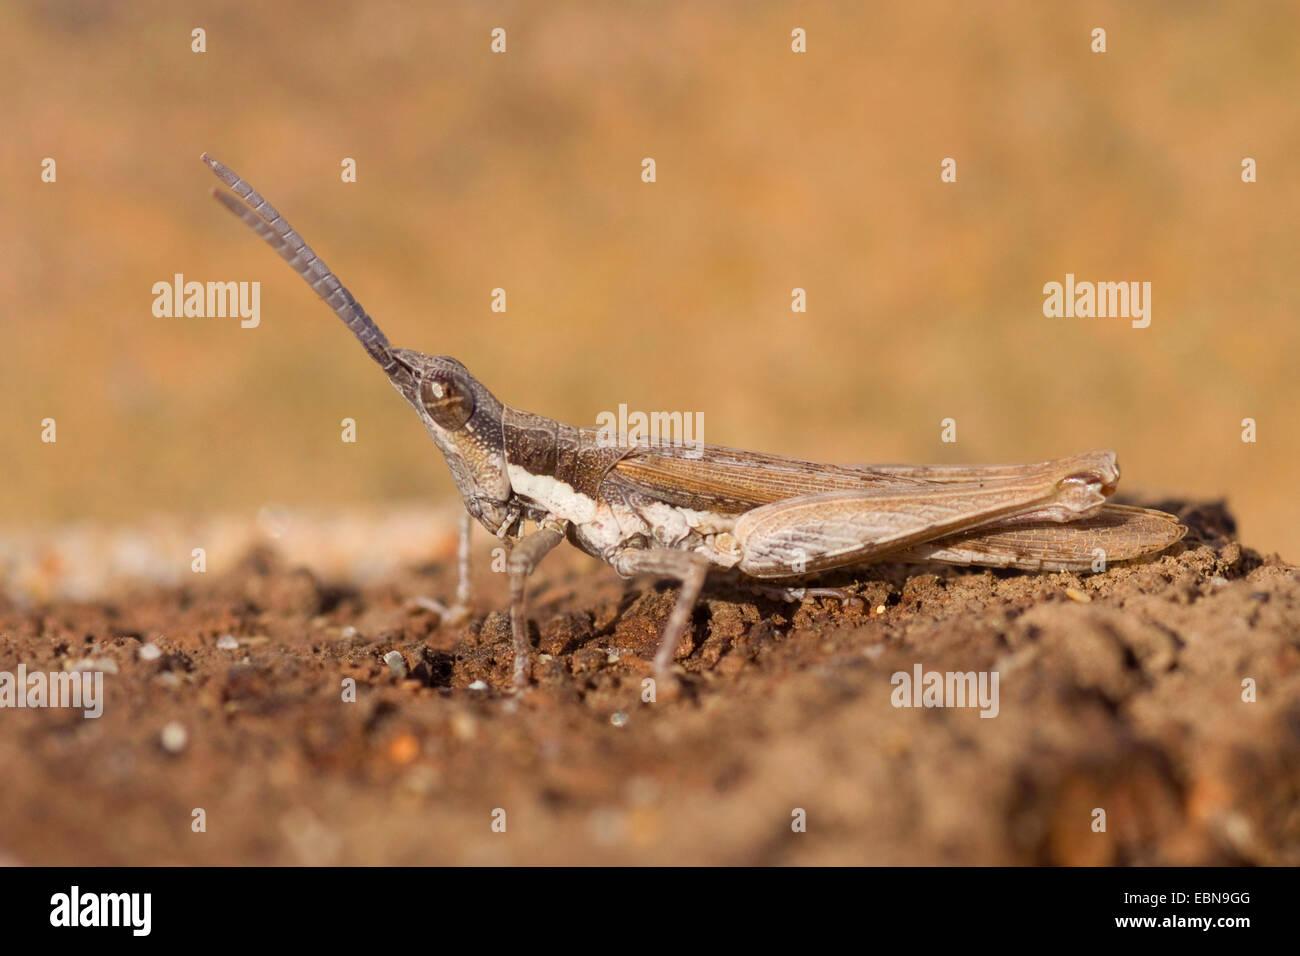 Saltamontes (Pyrgomorpha conica), retrato de longitud completa, Portugal Imagen De Stock